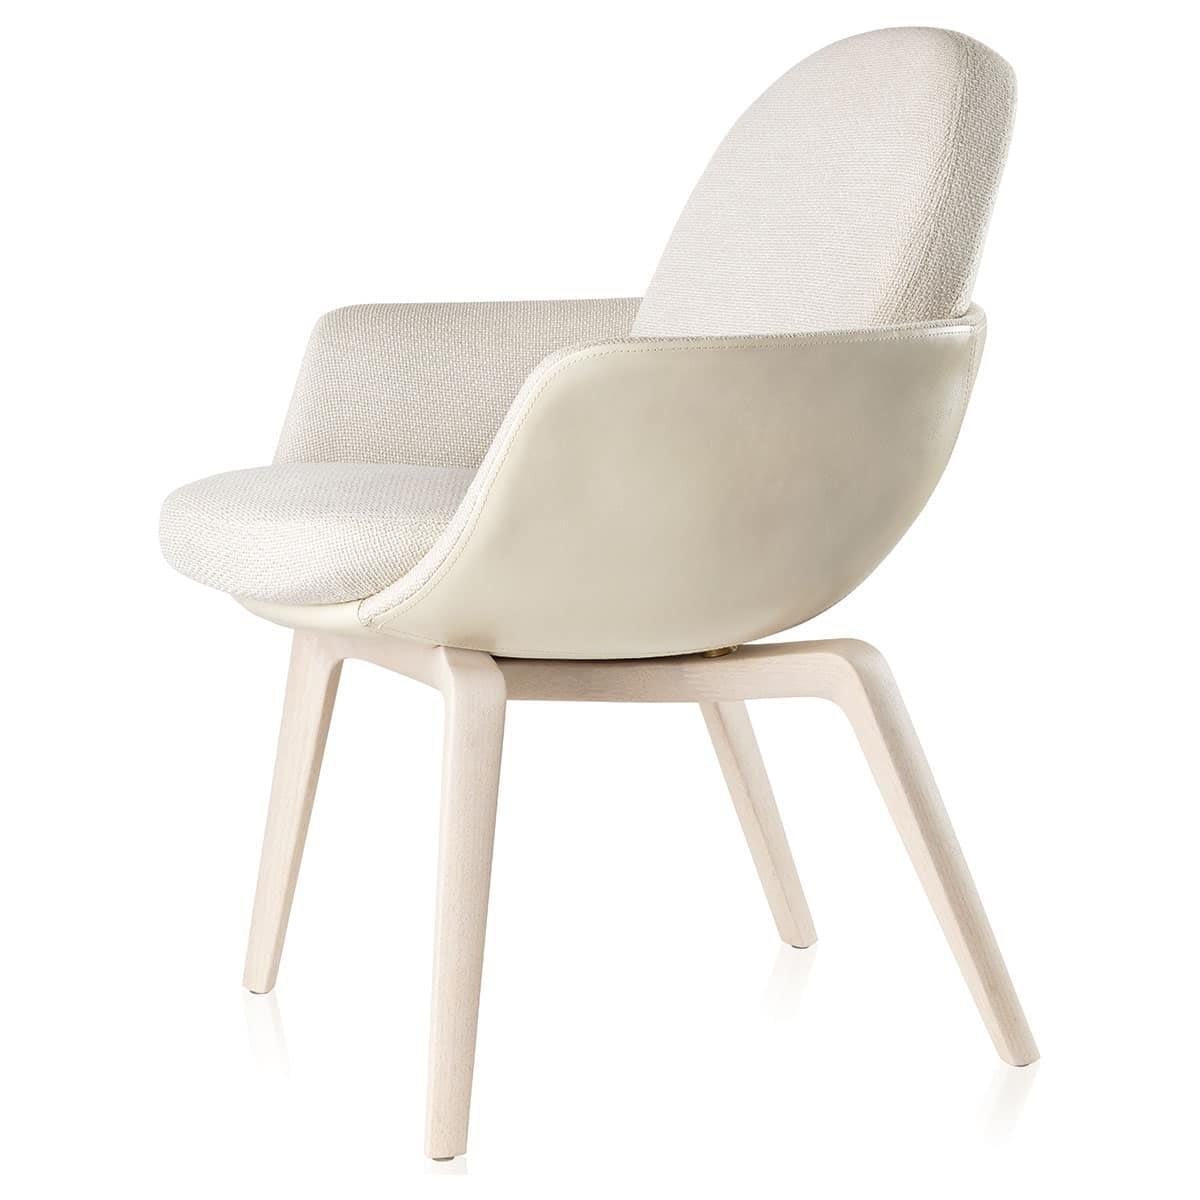 Designer Jader Almeidal Design Setti Chair